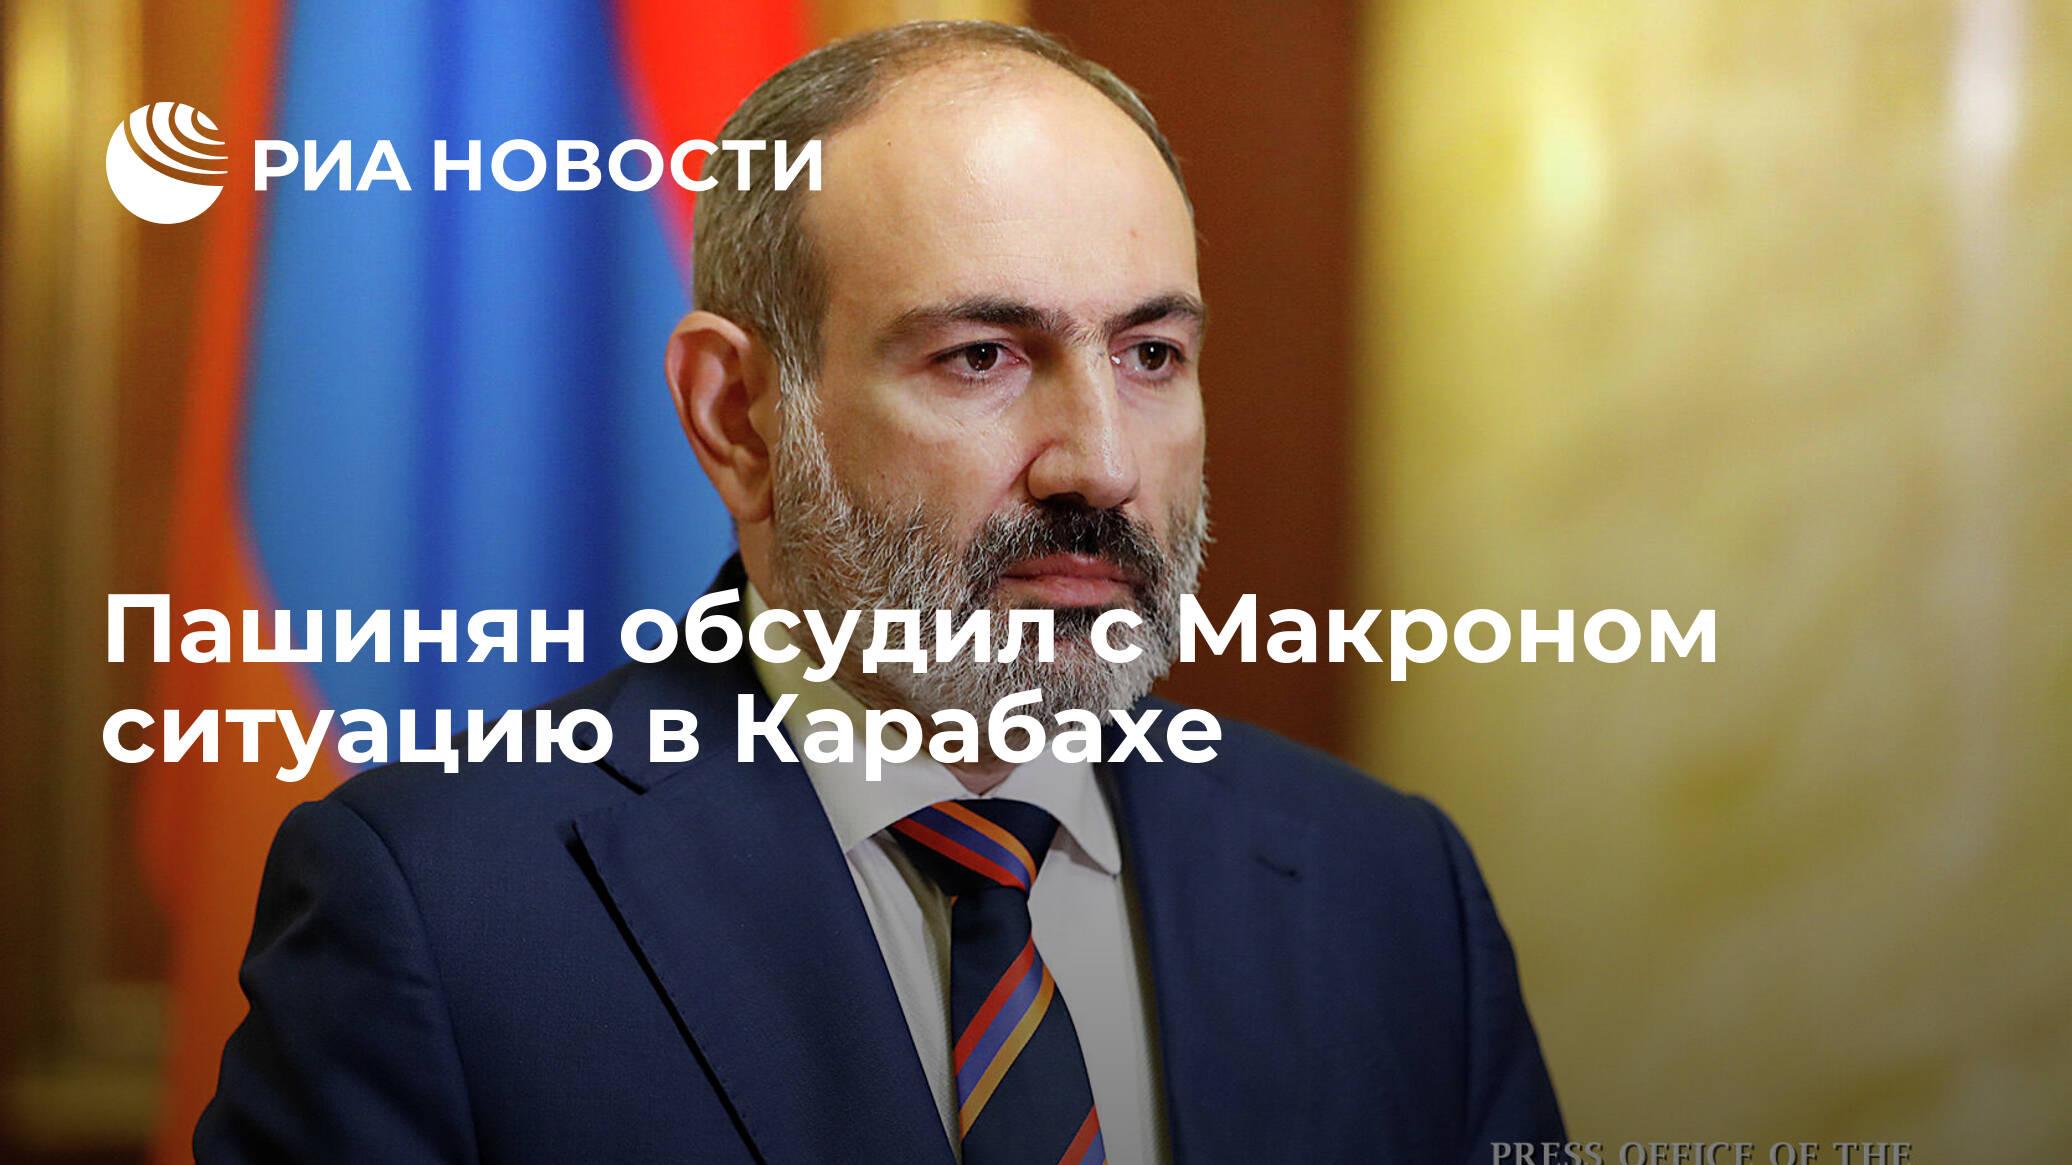 Пашинян обсудил с Макроном ситуацию в Карабахе